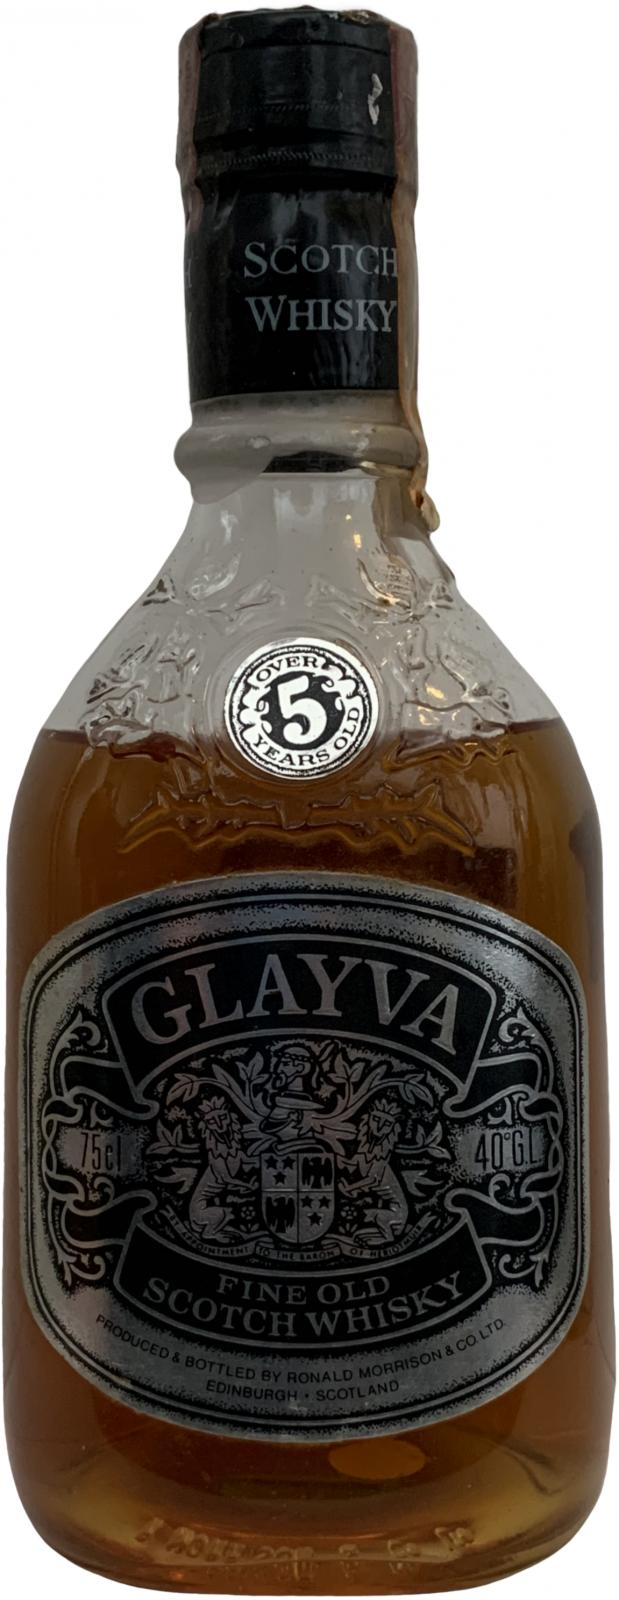 Glayva 05-year-old